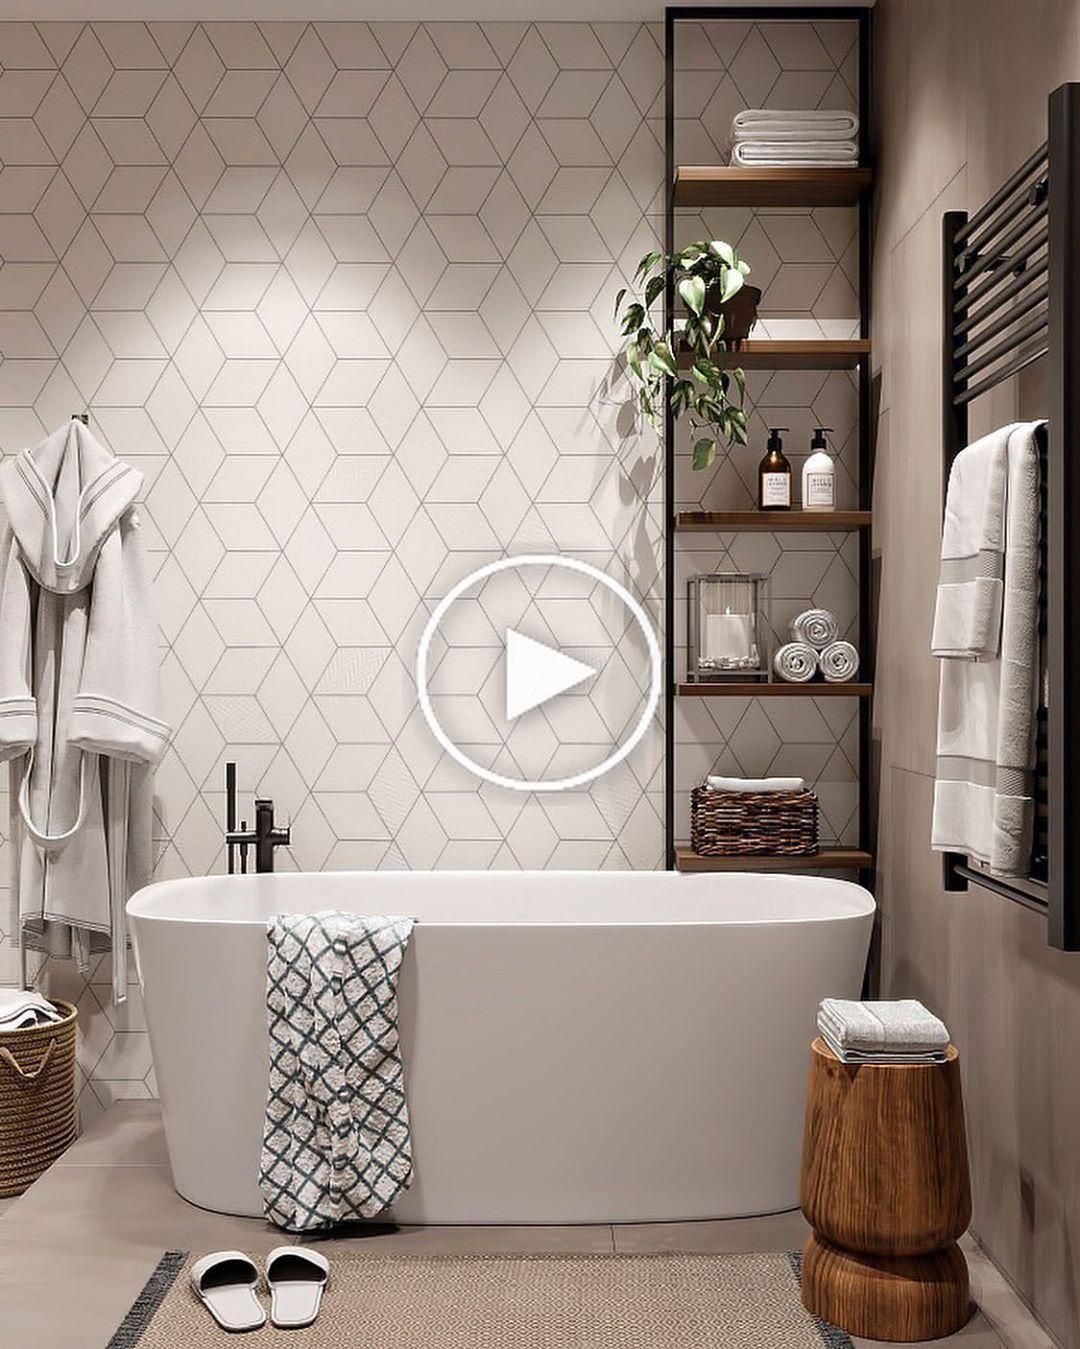 Modernebadkamer Badkamerideeen Bathroom Design Small Modern Bathroom Interior Design Best Bathroom Designs Home decor bathroom pictures